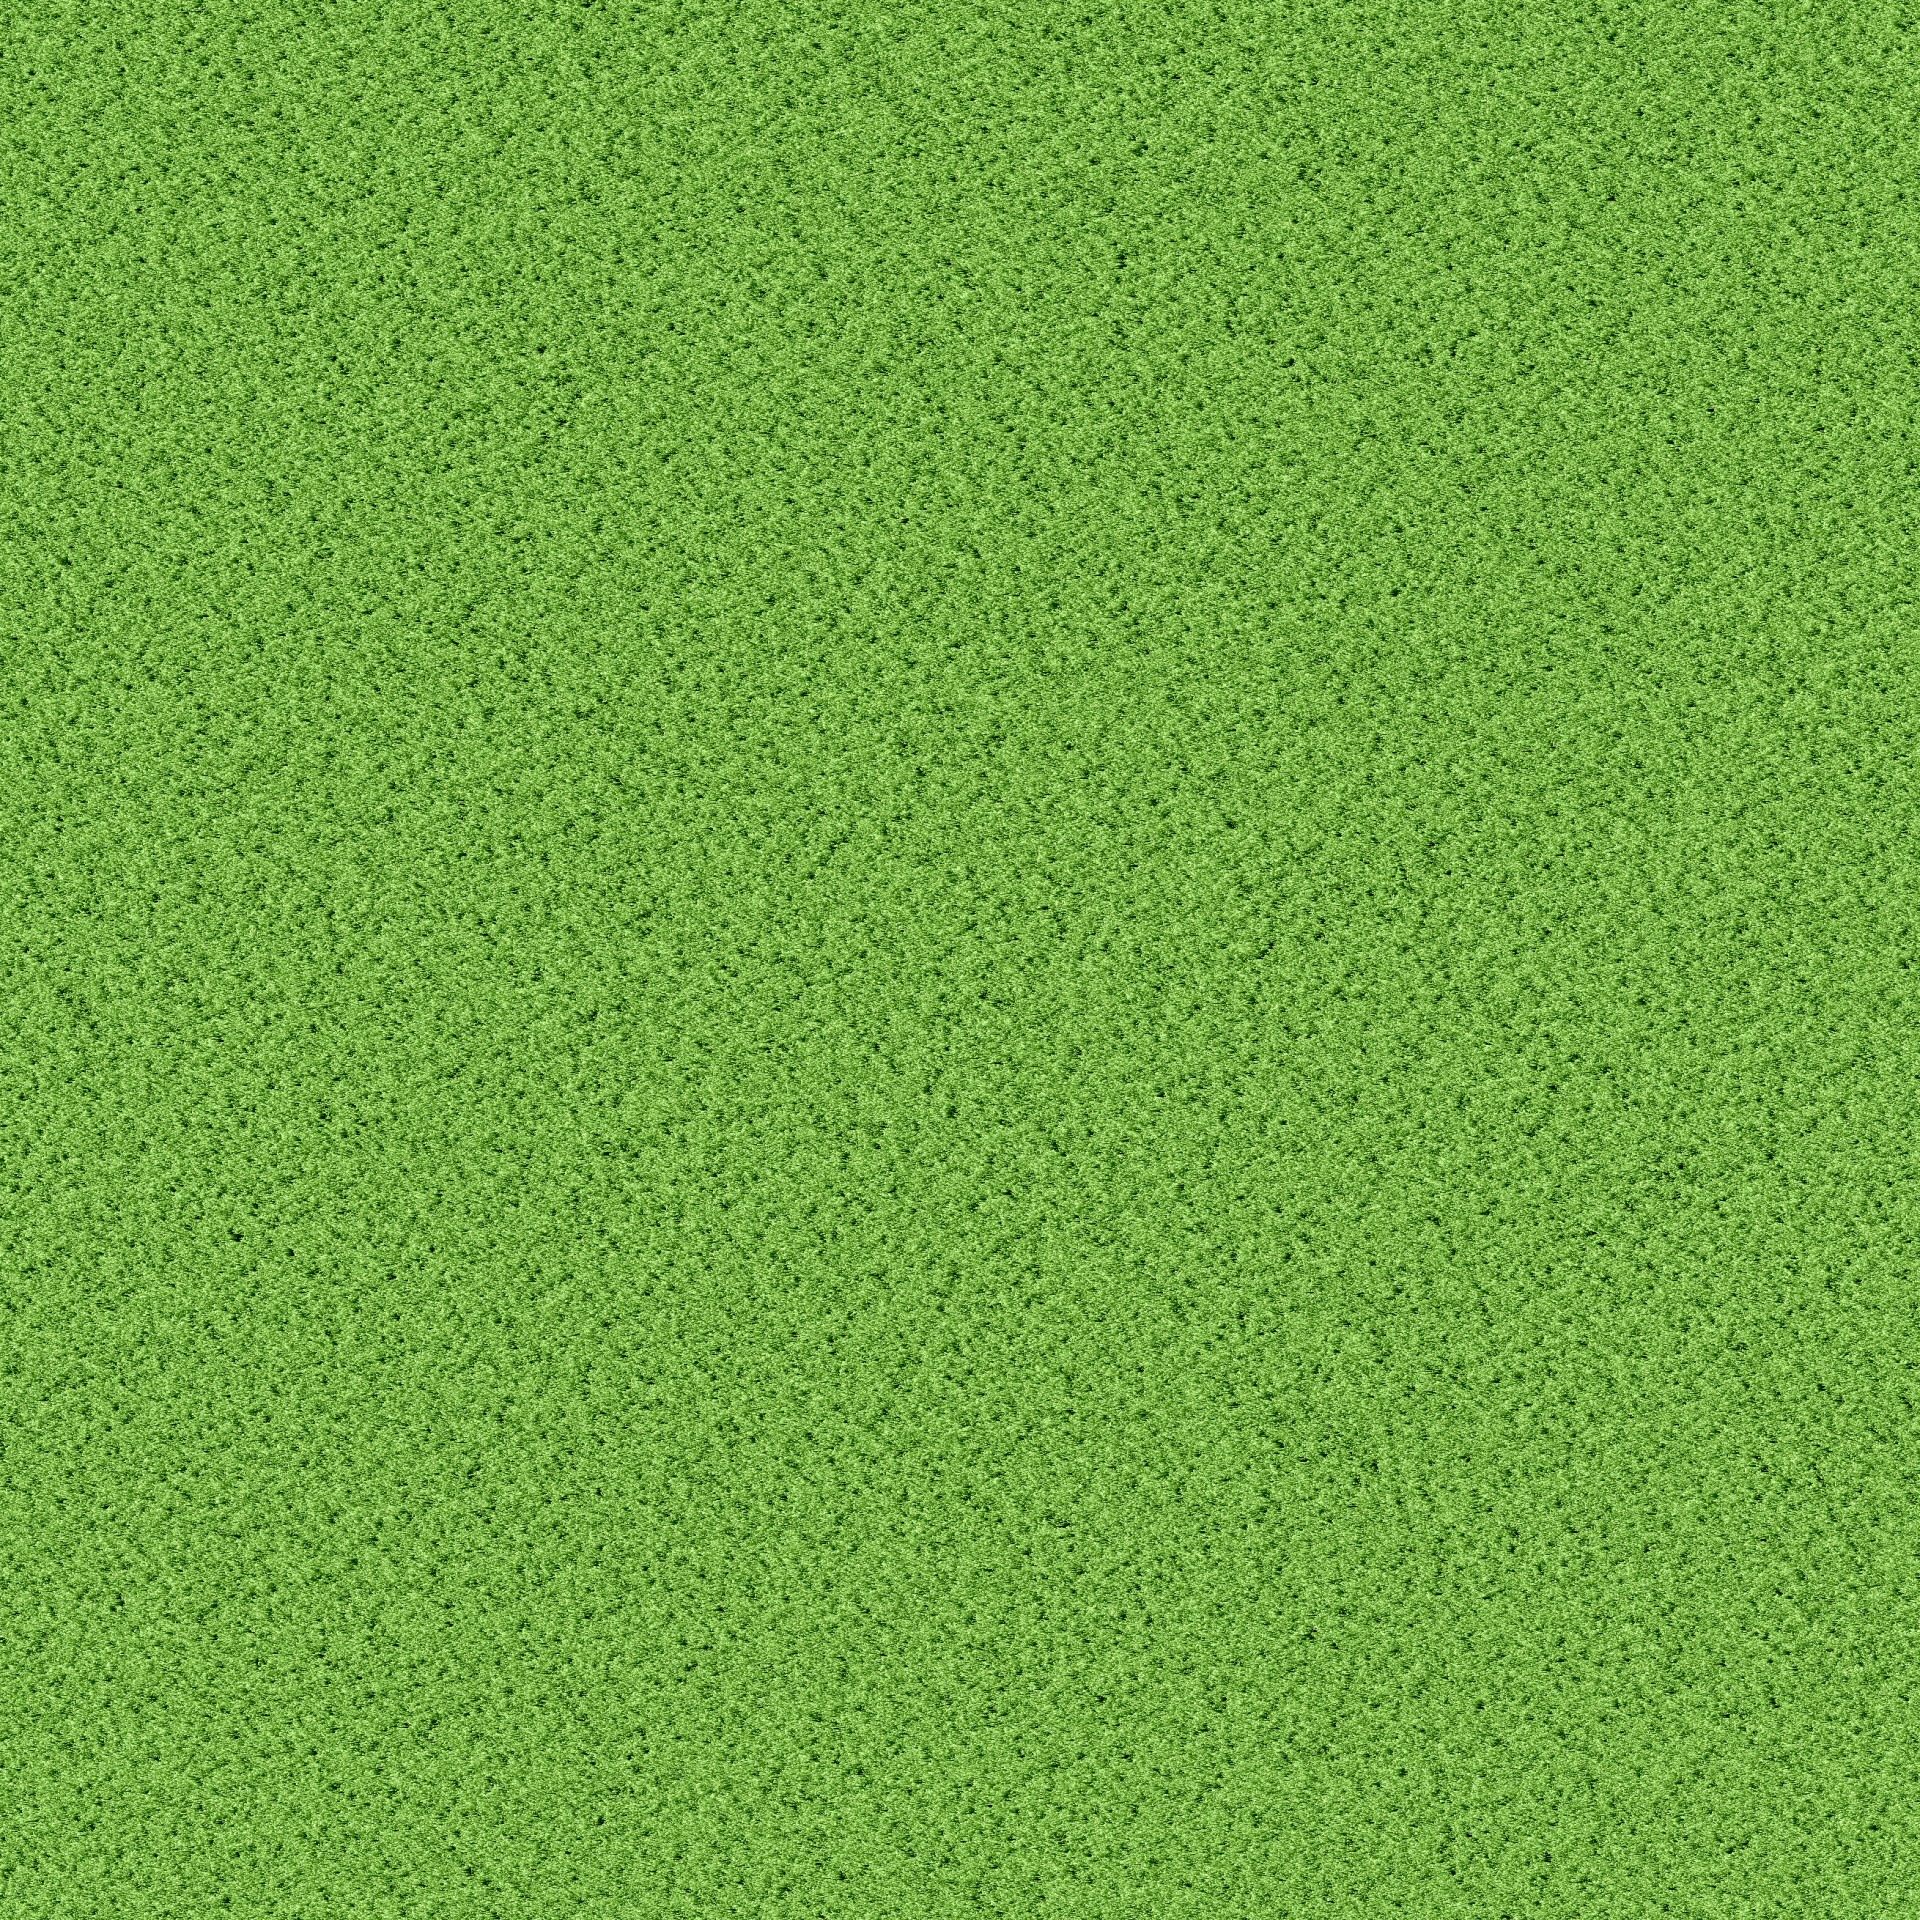 Golf Wallpaper Hd Grass Texture Background Green Free Stock Photo Public